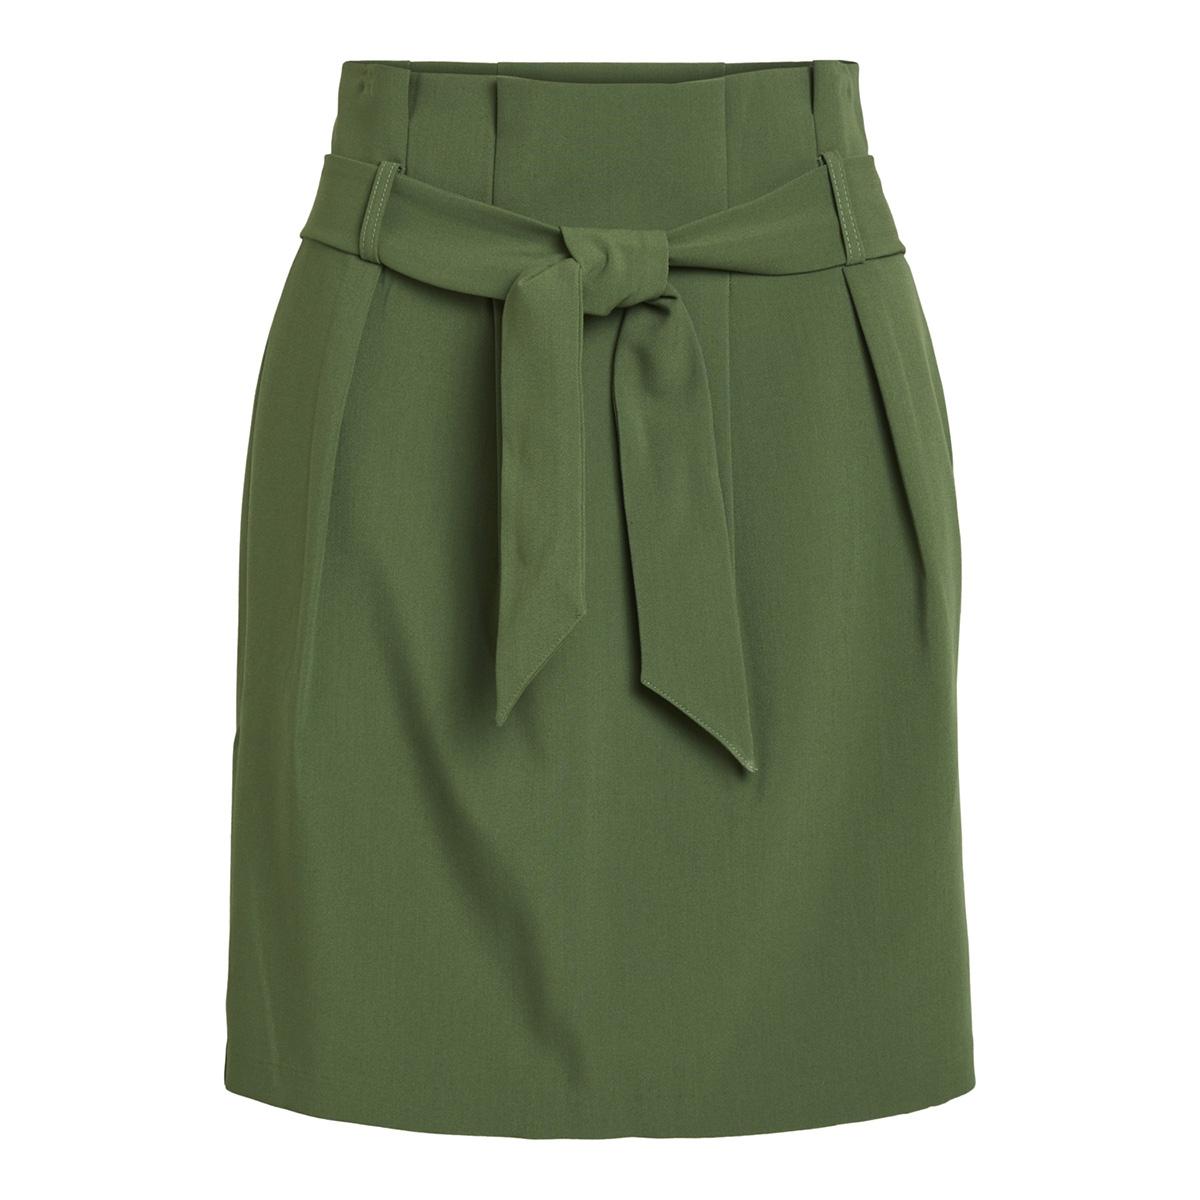 objabella mw mini skirt a div 23029141 object rok black forest